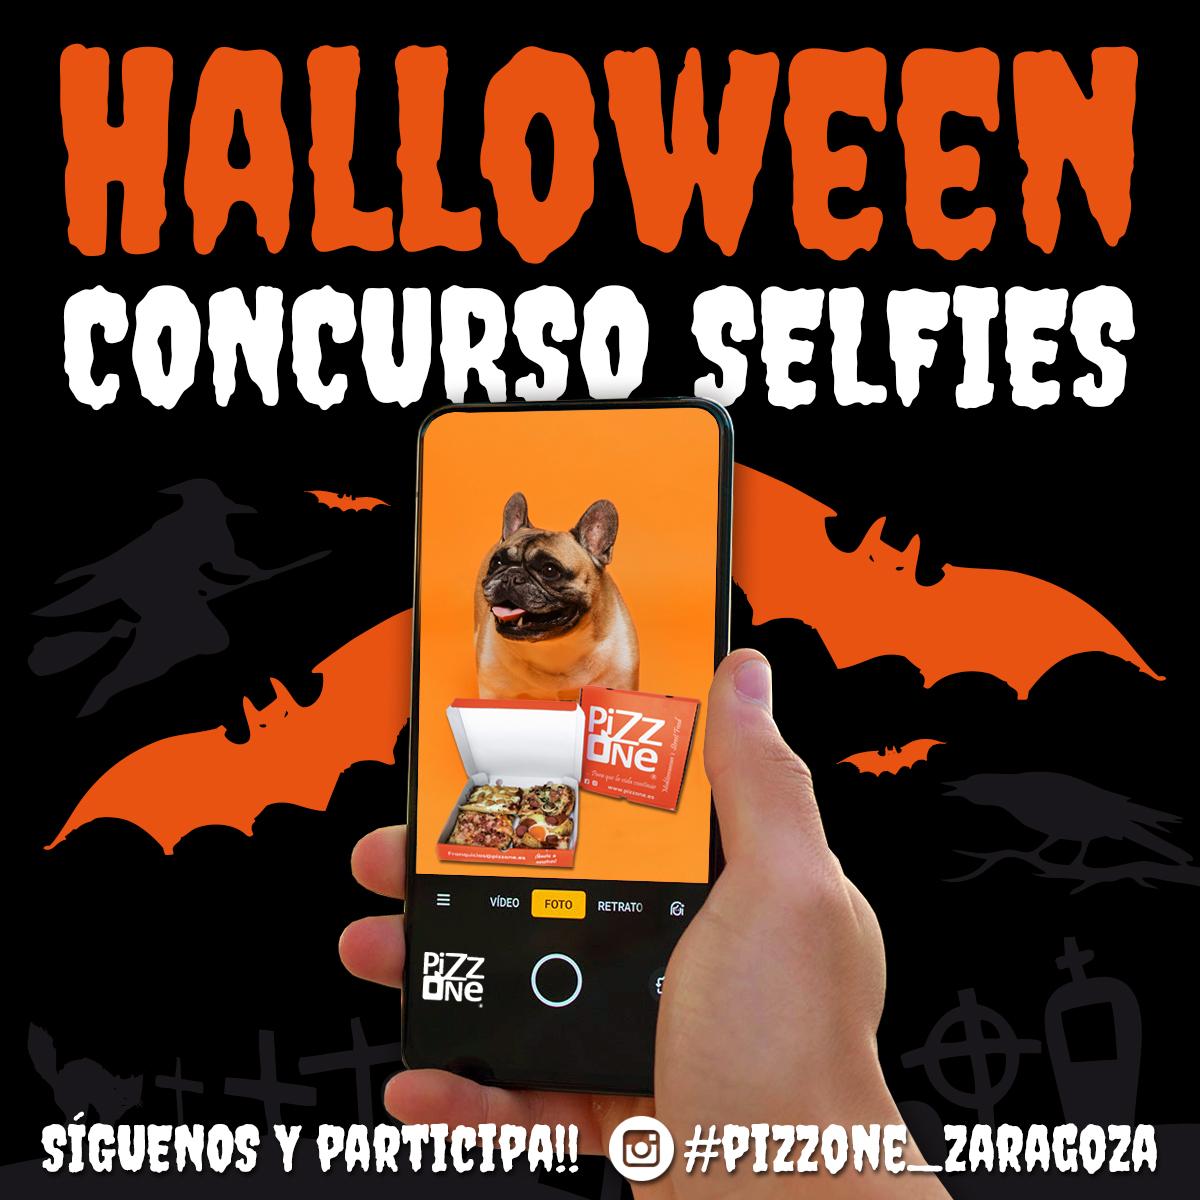 Concurso de Selfies de Halloween